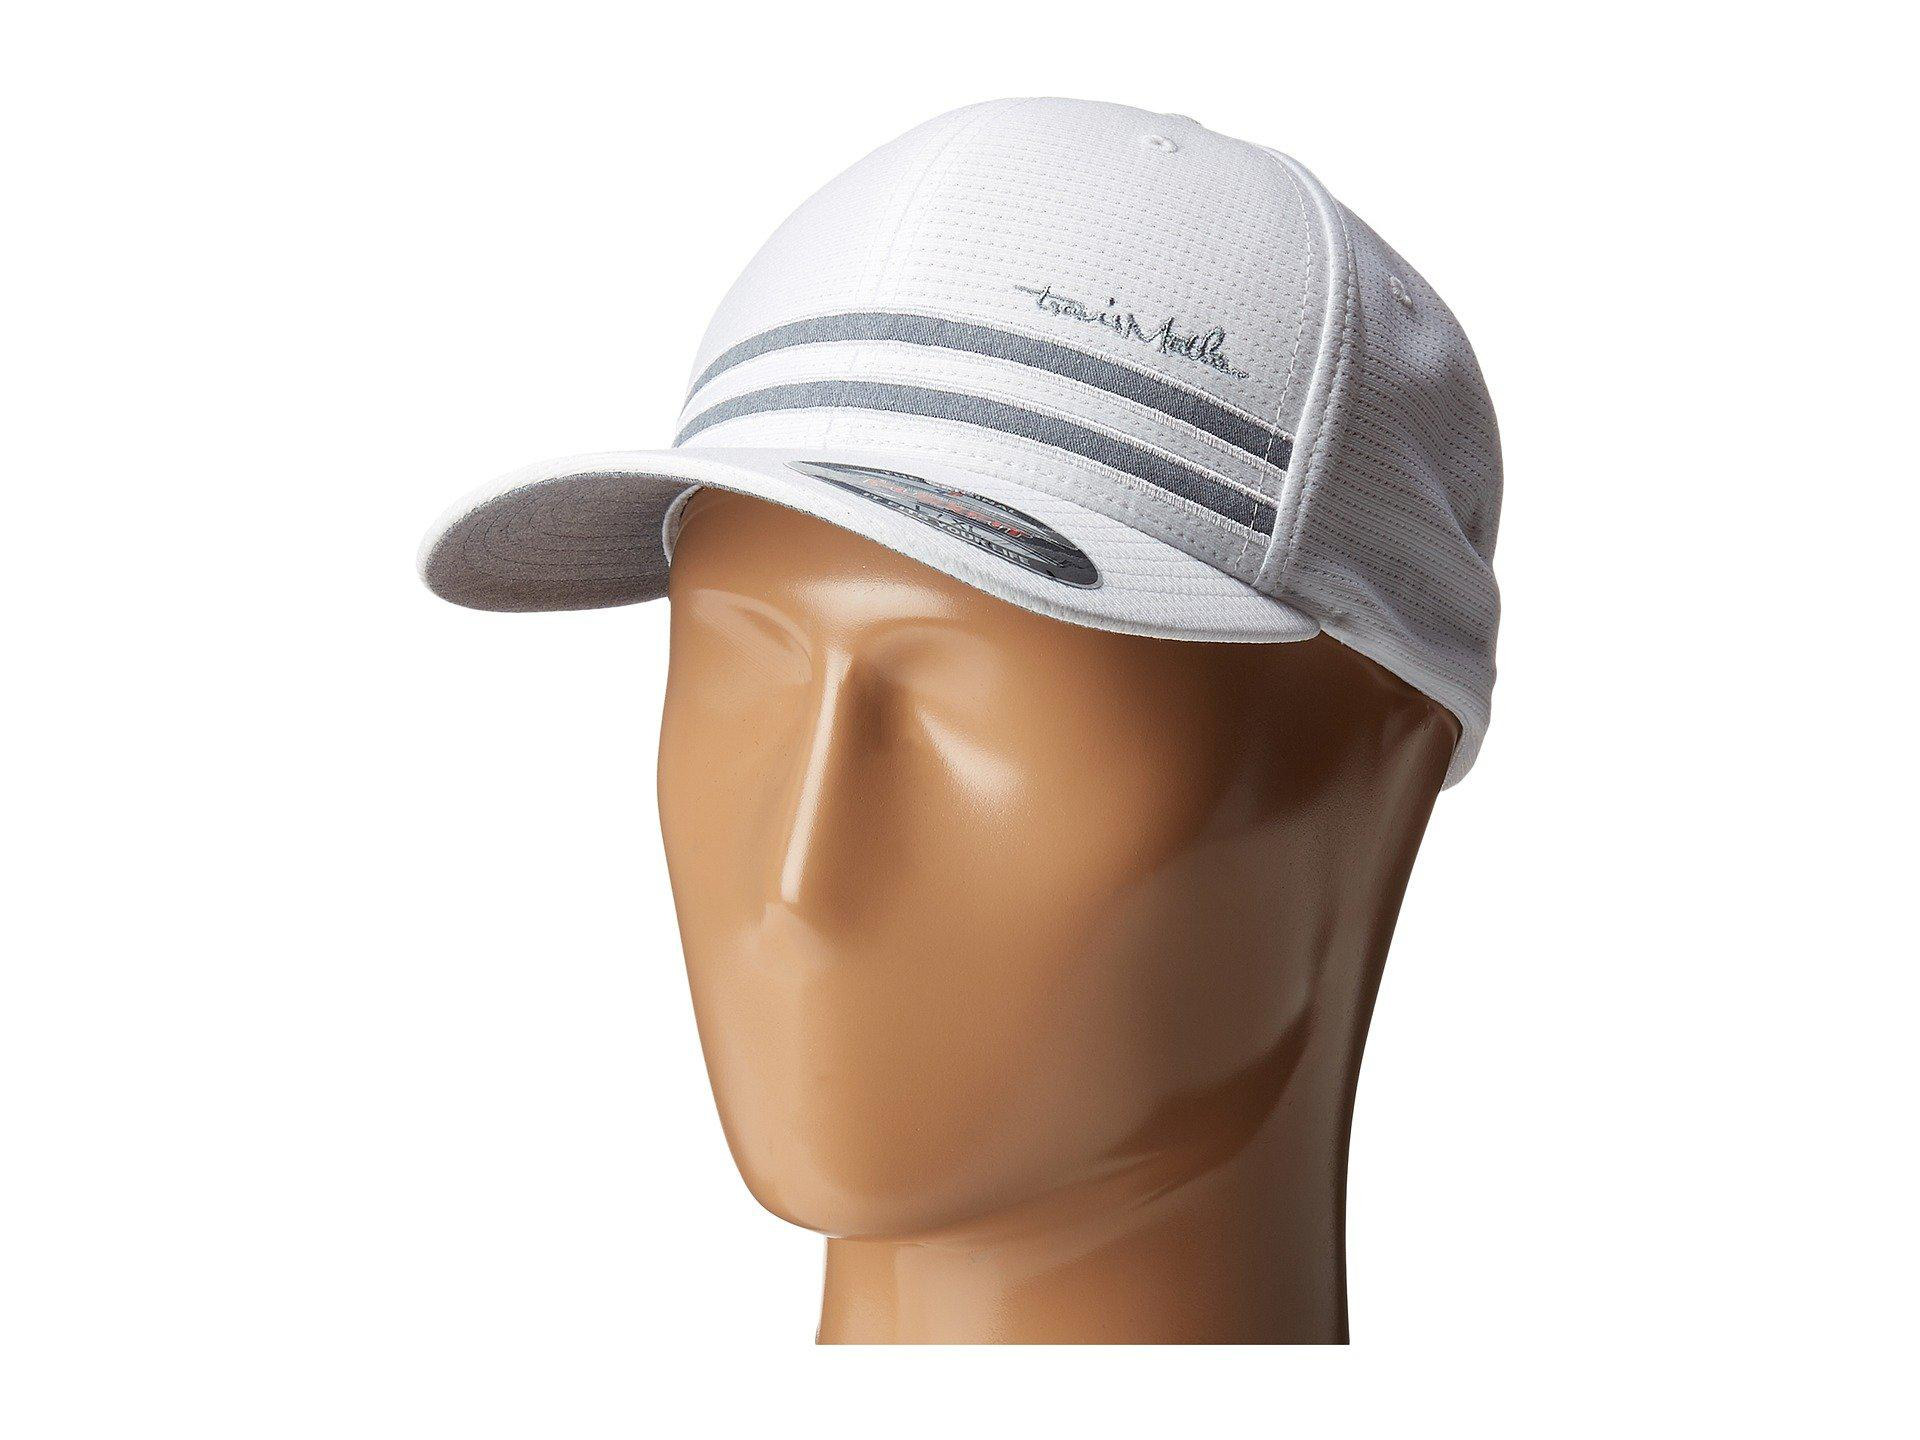 Lyst - Travis Mathew Hout (black) Caps in White for Men d5e304dad9e2